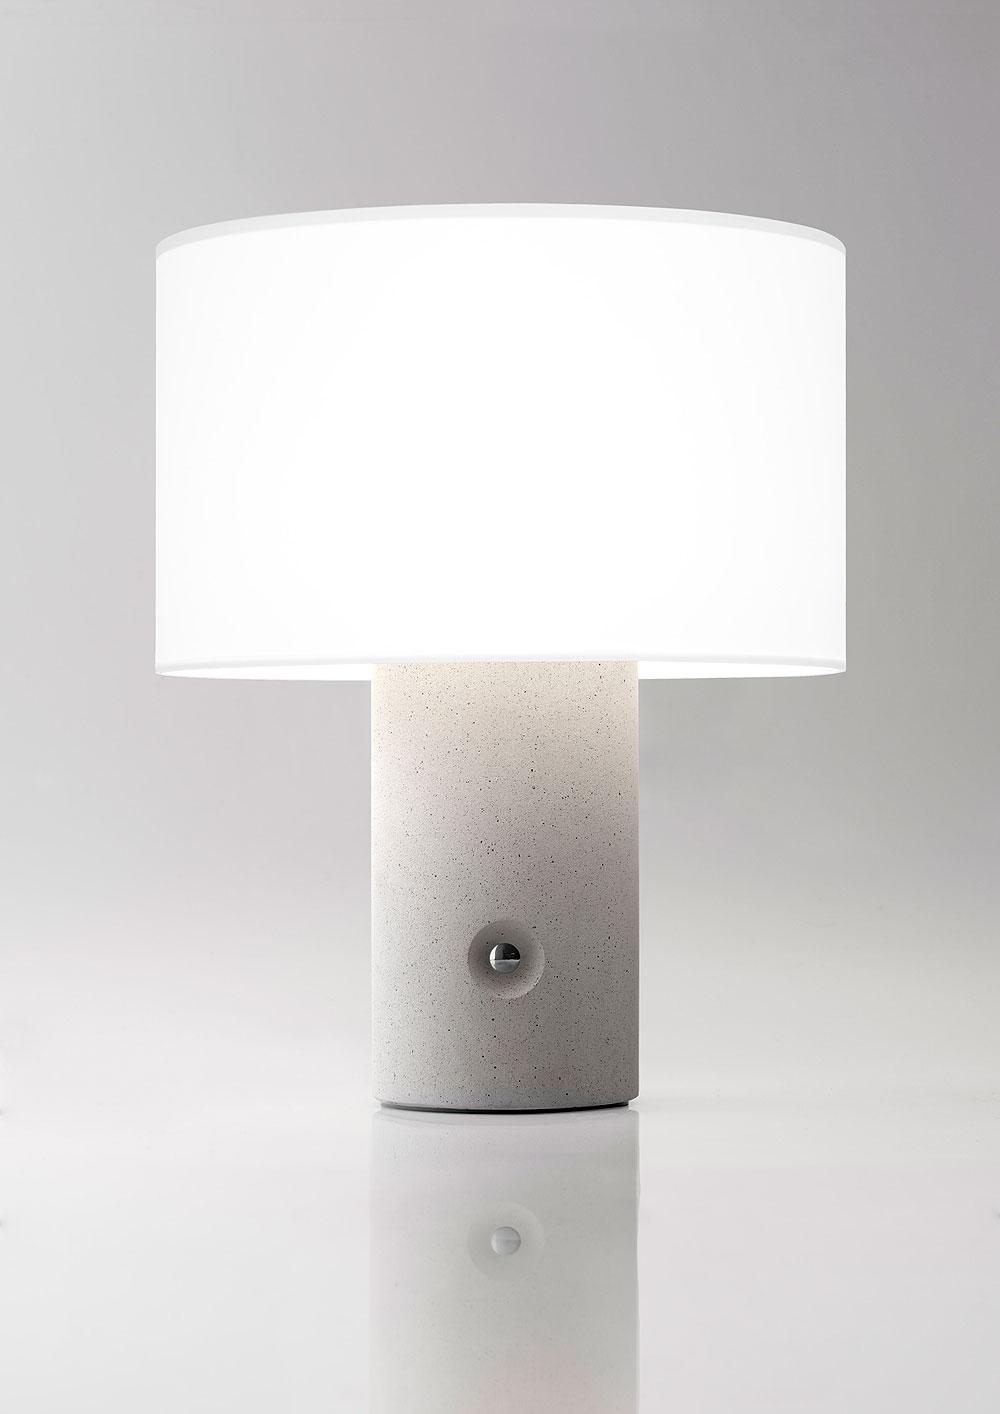 iluminacion-stones-sharon-ramon-ubeda-otto-canalda-metalarte (9)